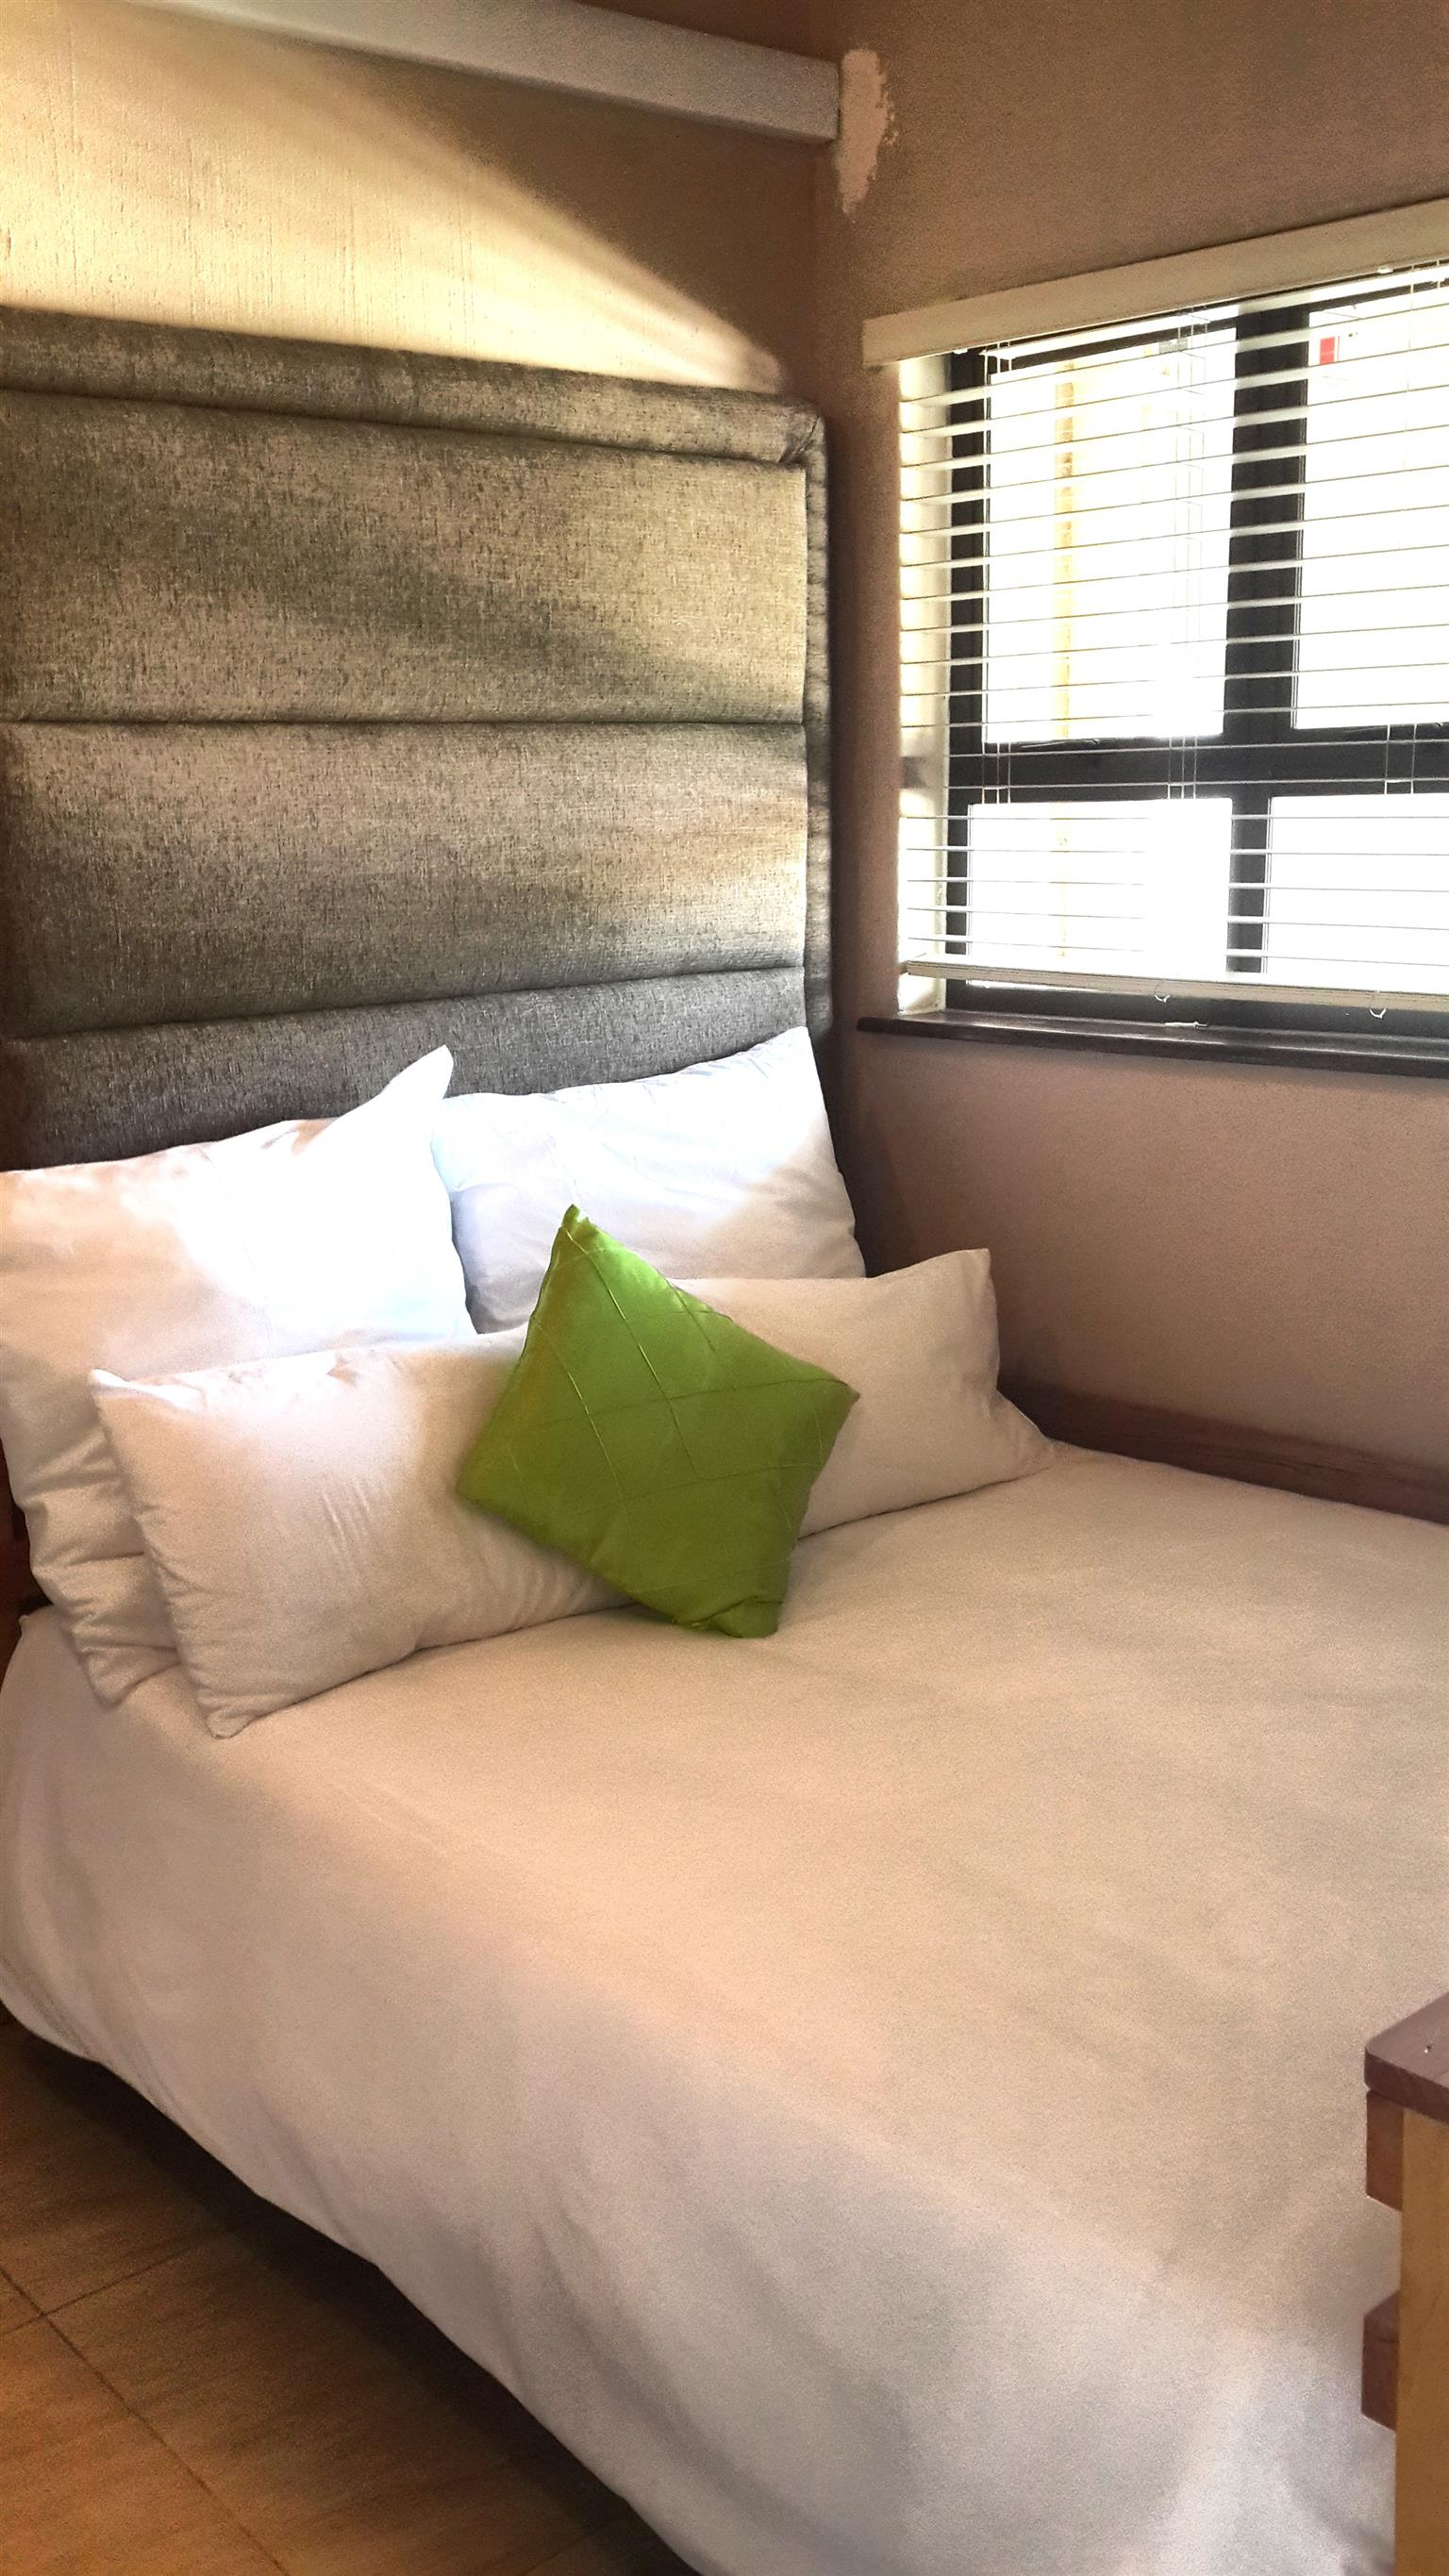 2 BED - SELF-CATERING WINKELSPRUIT AMANZIMTOTI, 24 HR SEC, GROUND FLOOR, ON THE BEACH